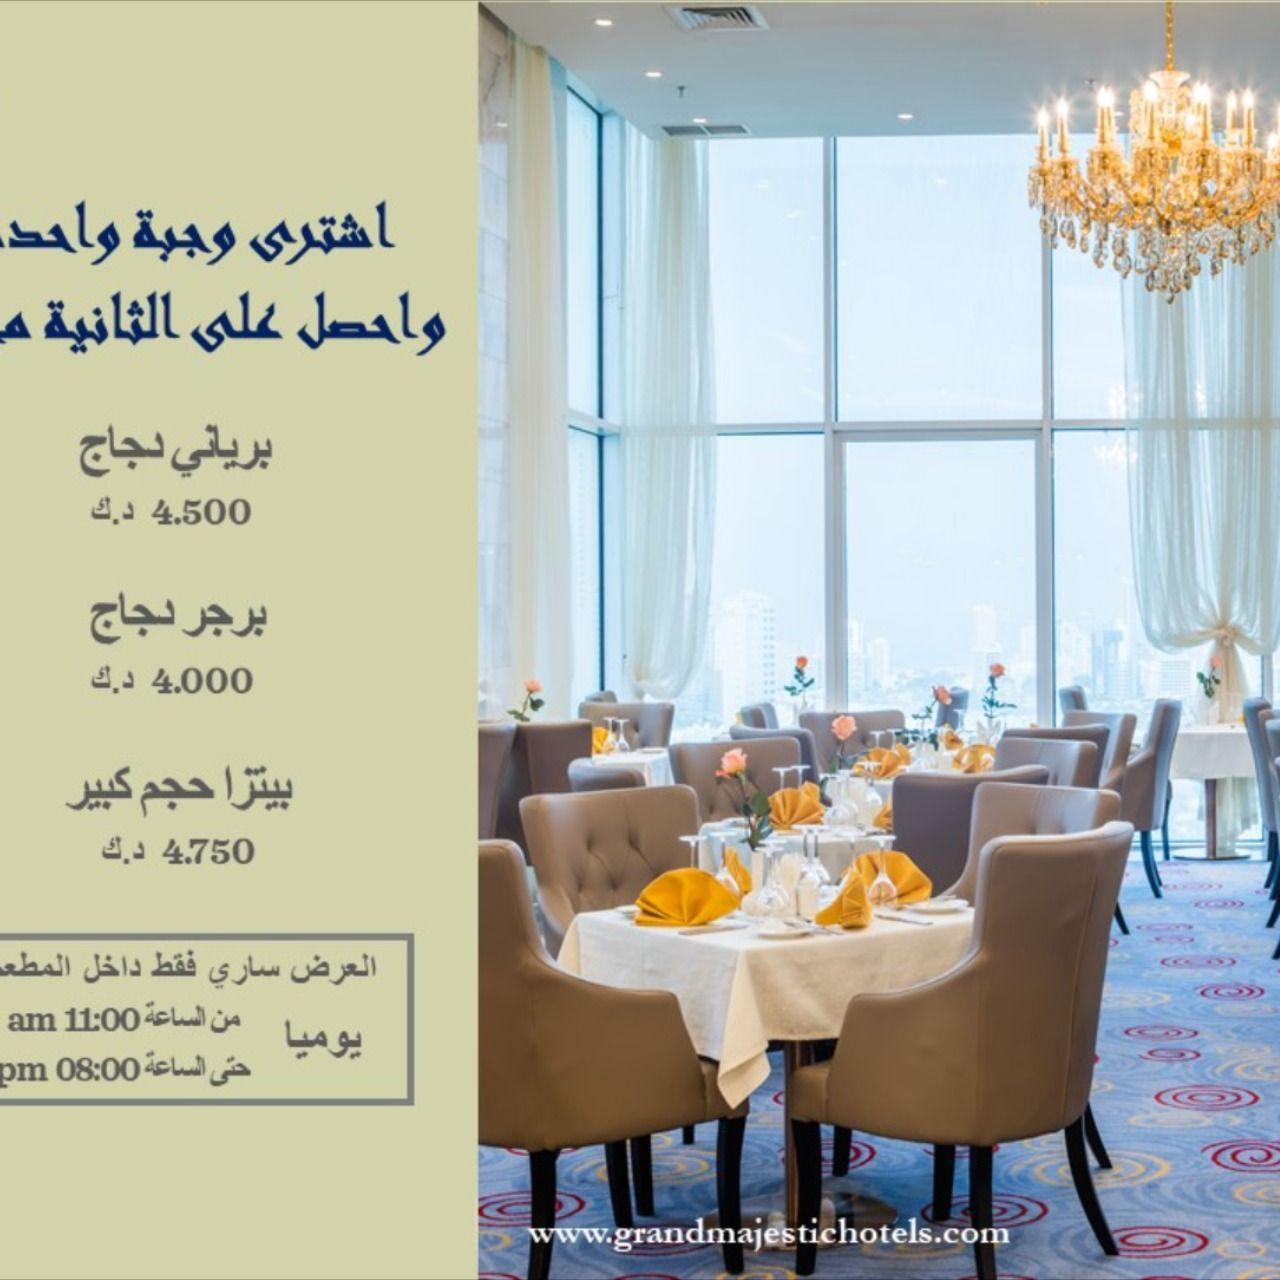 Enjoy Our Buy 1 Take 1 Free وأحصل على الثانية مجانا إشترى وجبة واحدة Majestic Hotel Hotel Banquet